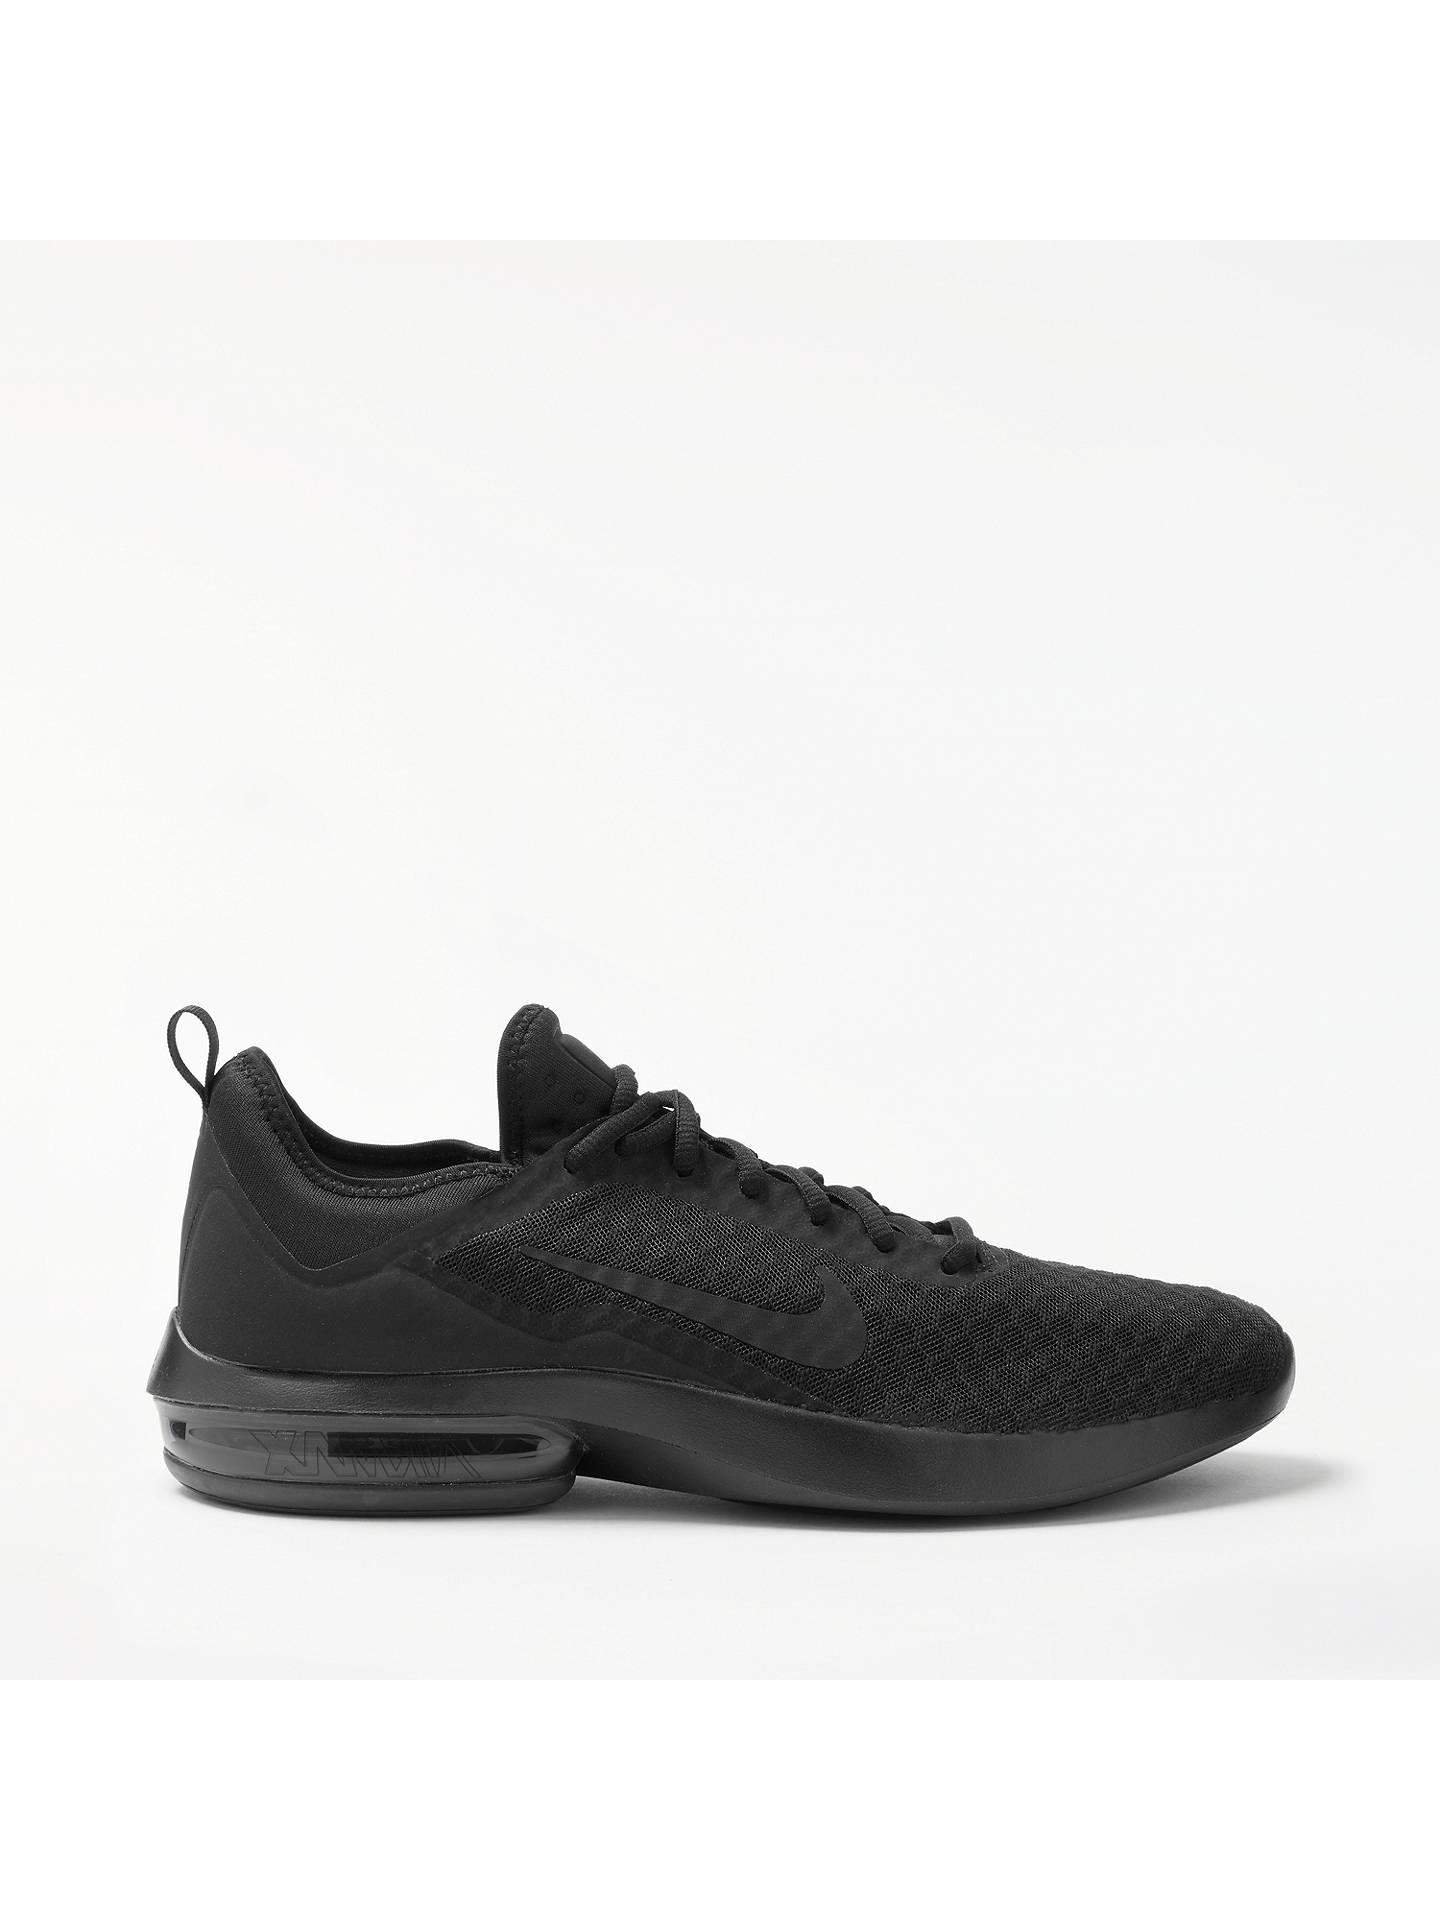 4f4522d8386 BuyNike Air Max Kantara Men s Running Shoe